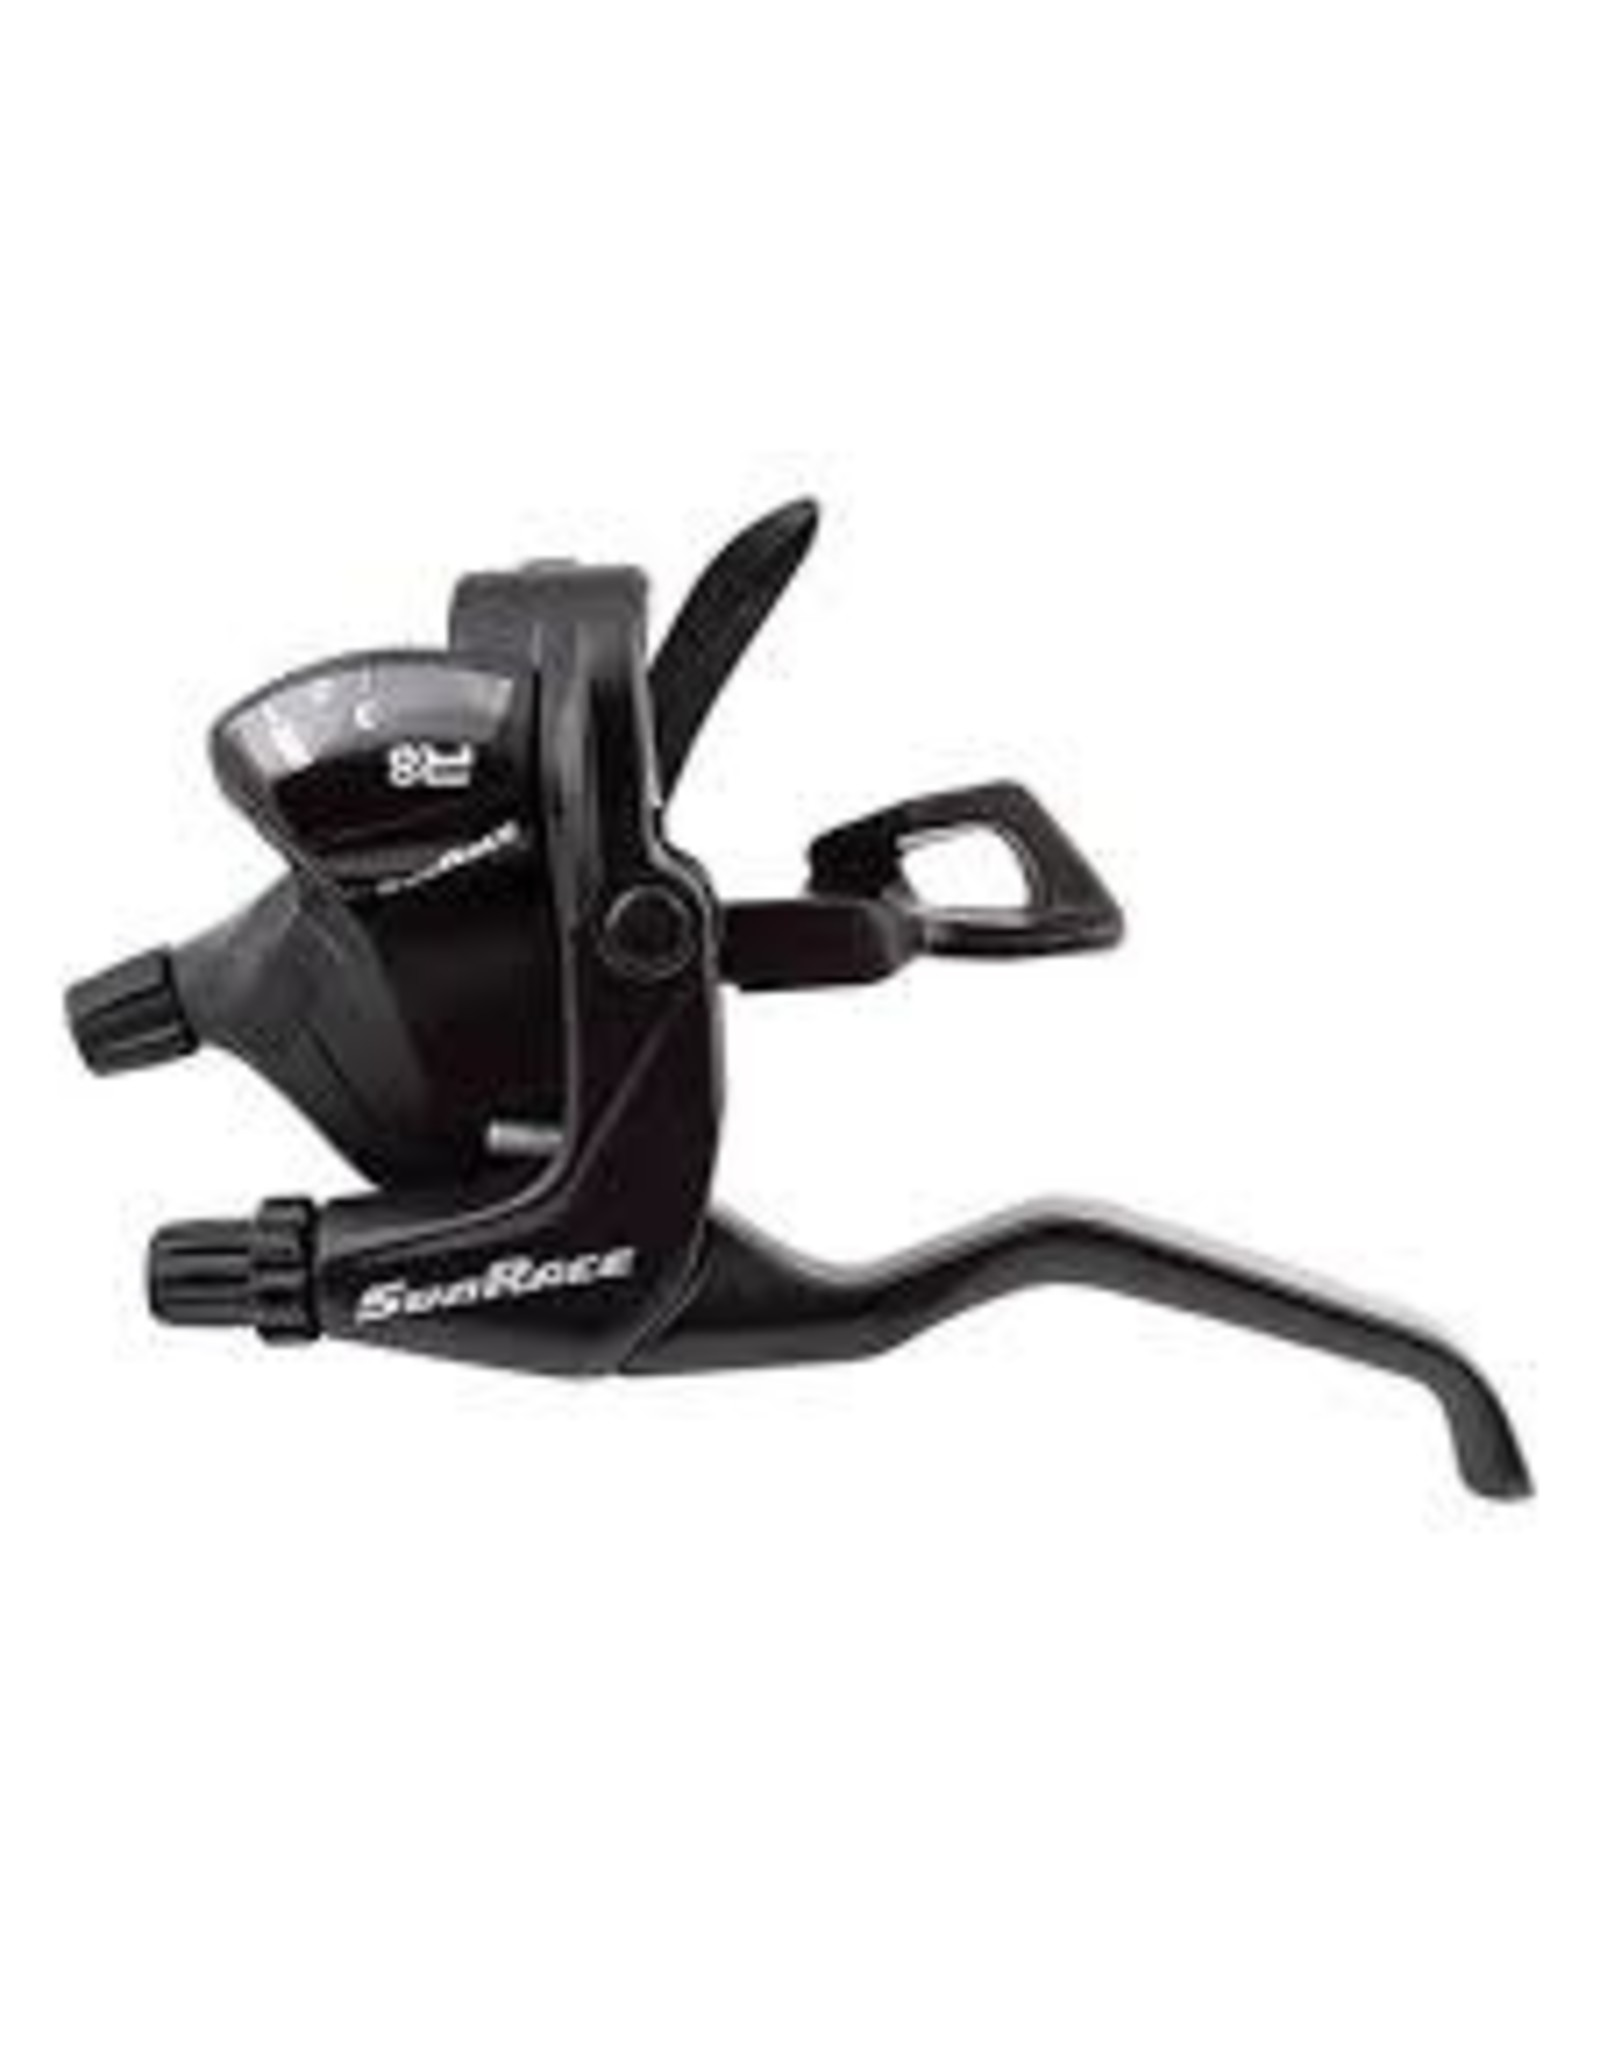 SunRace Shifter Sunrace STM406 3s LH Trigger/Brake V BK